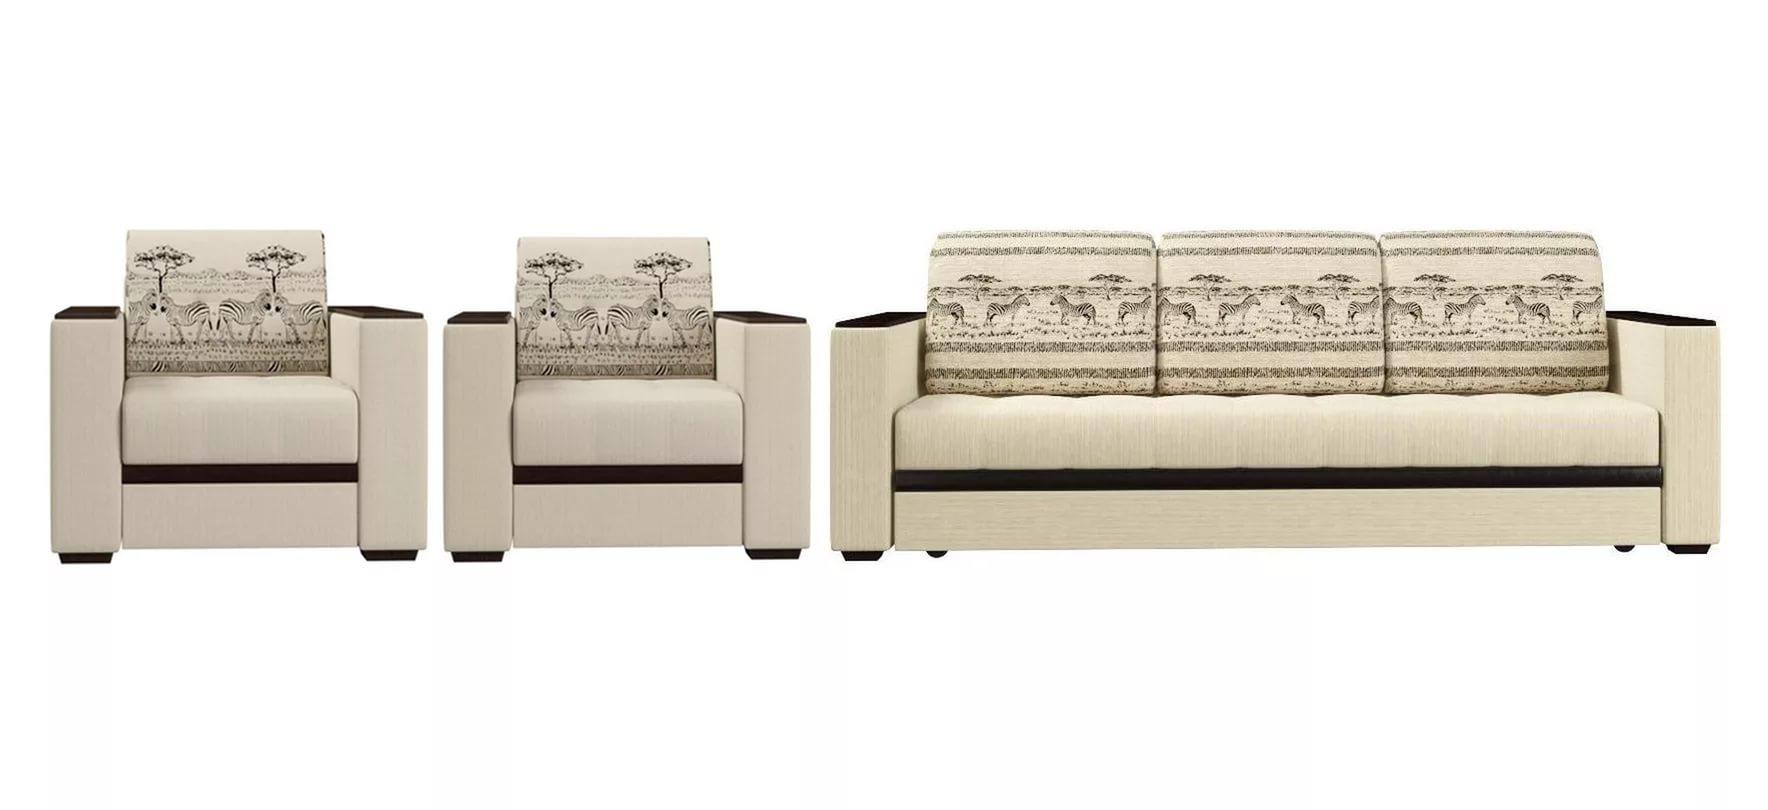 Комплект мебели фото3